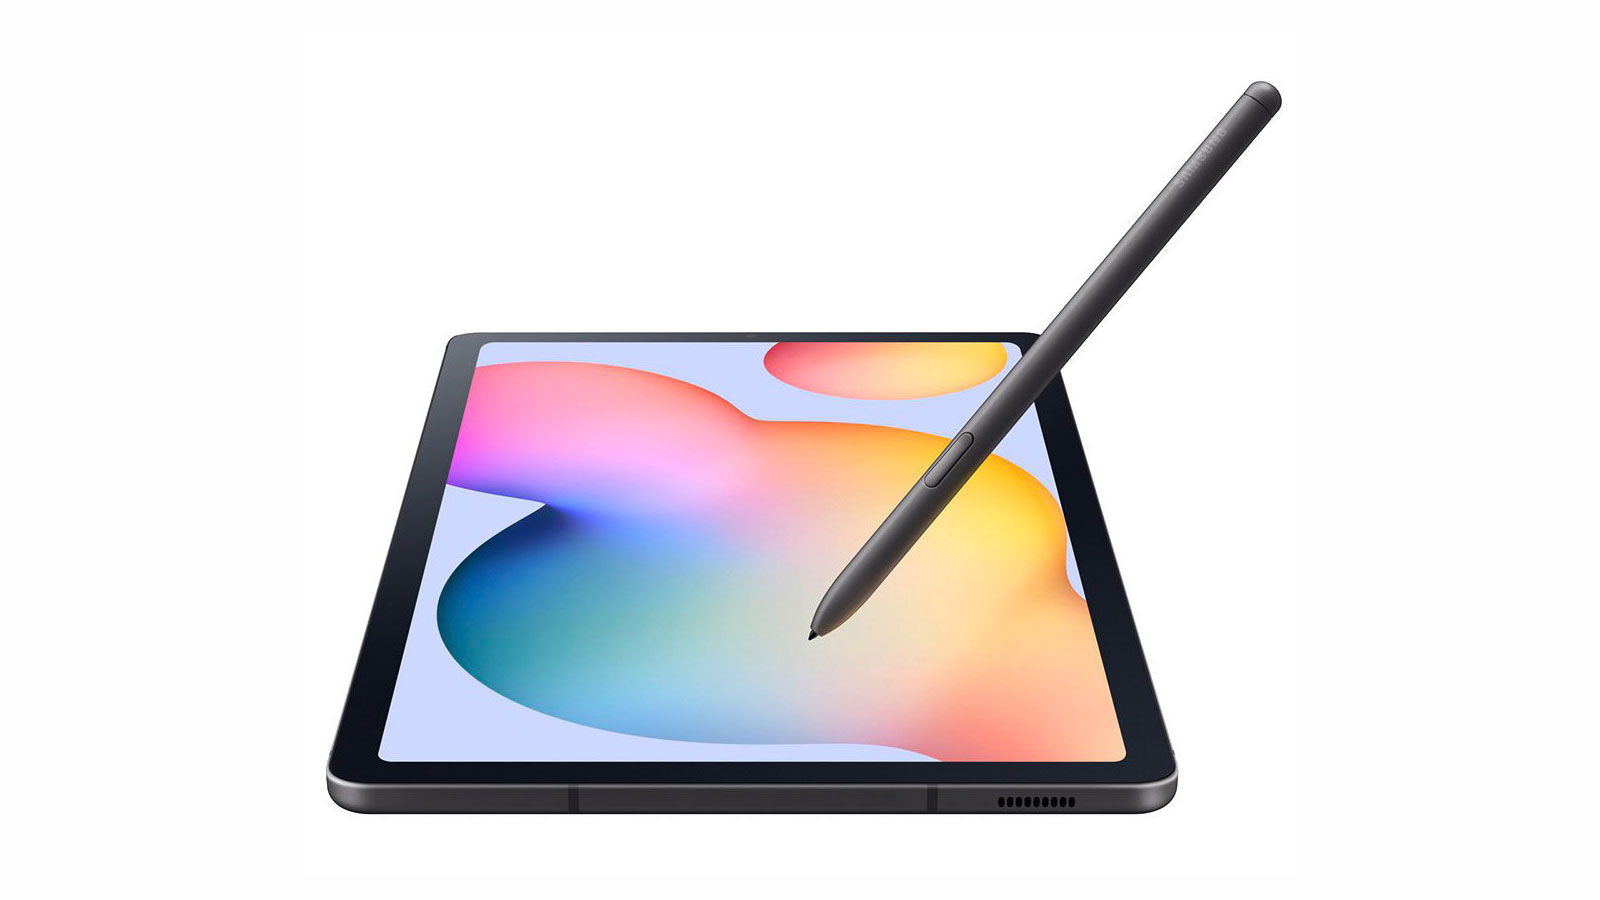 Samsung Galaxy Tab S6 Lite WiFi 10.4